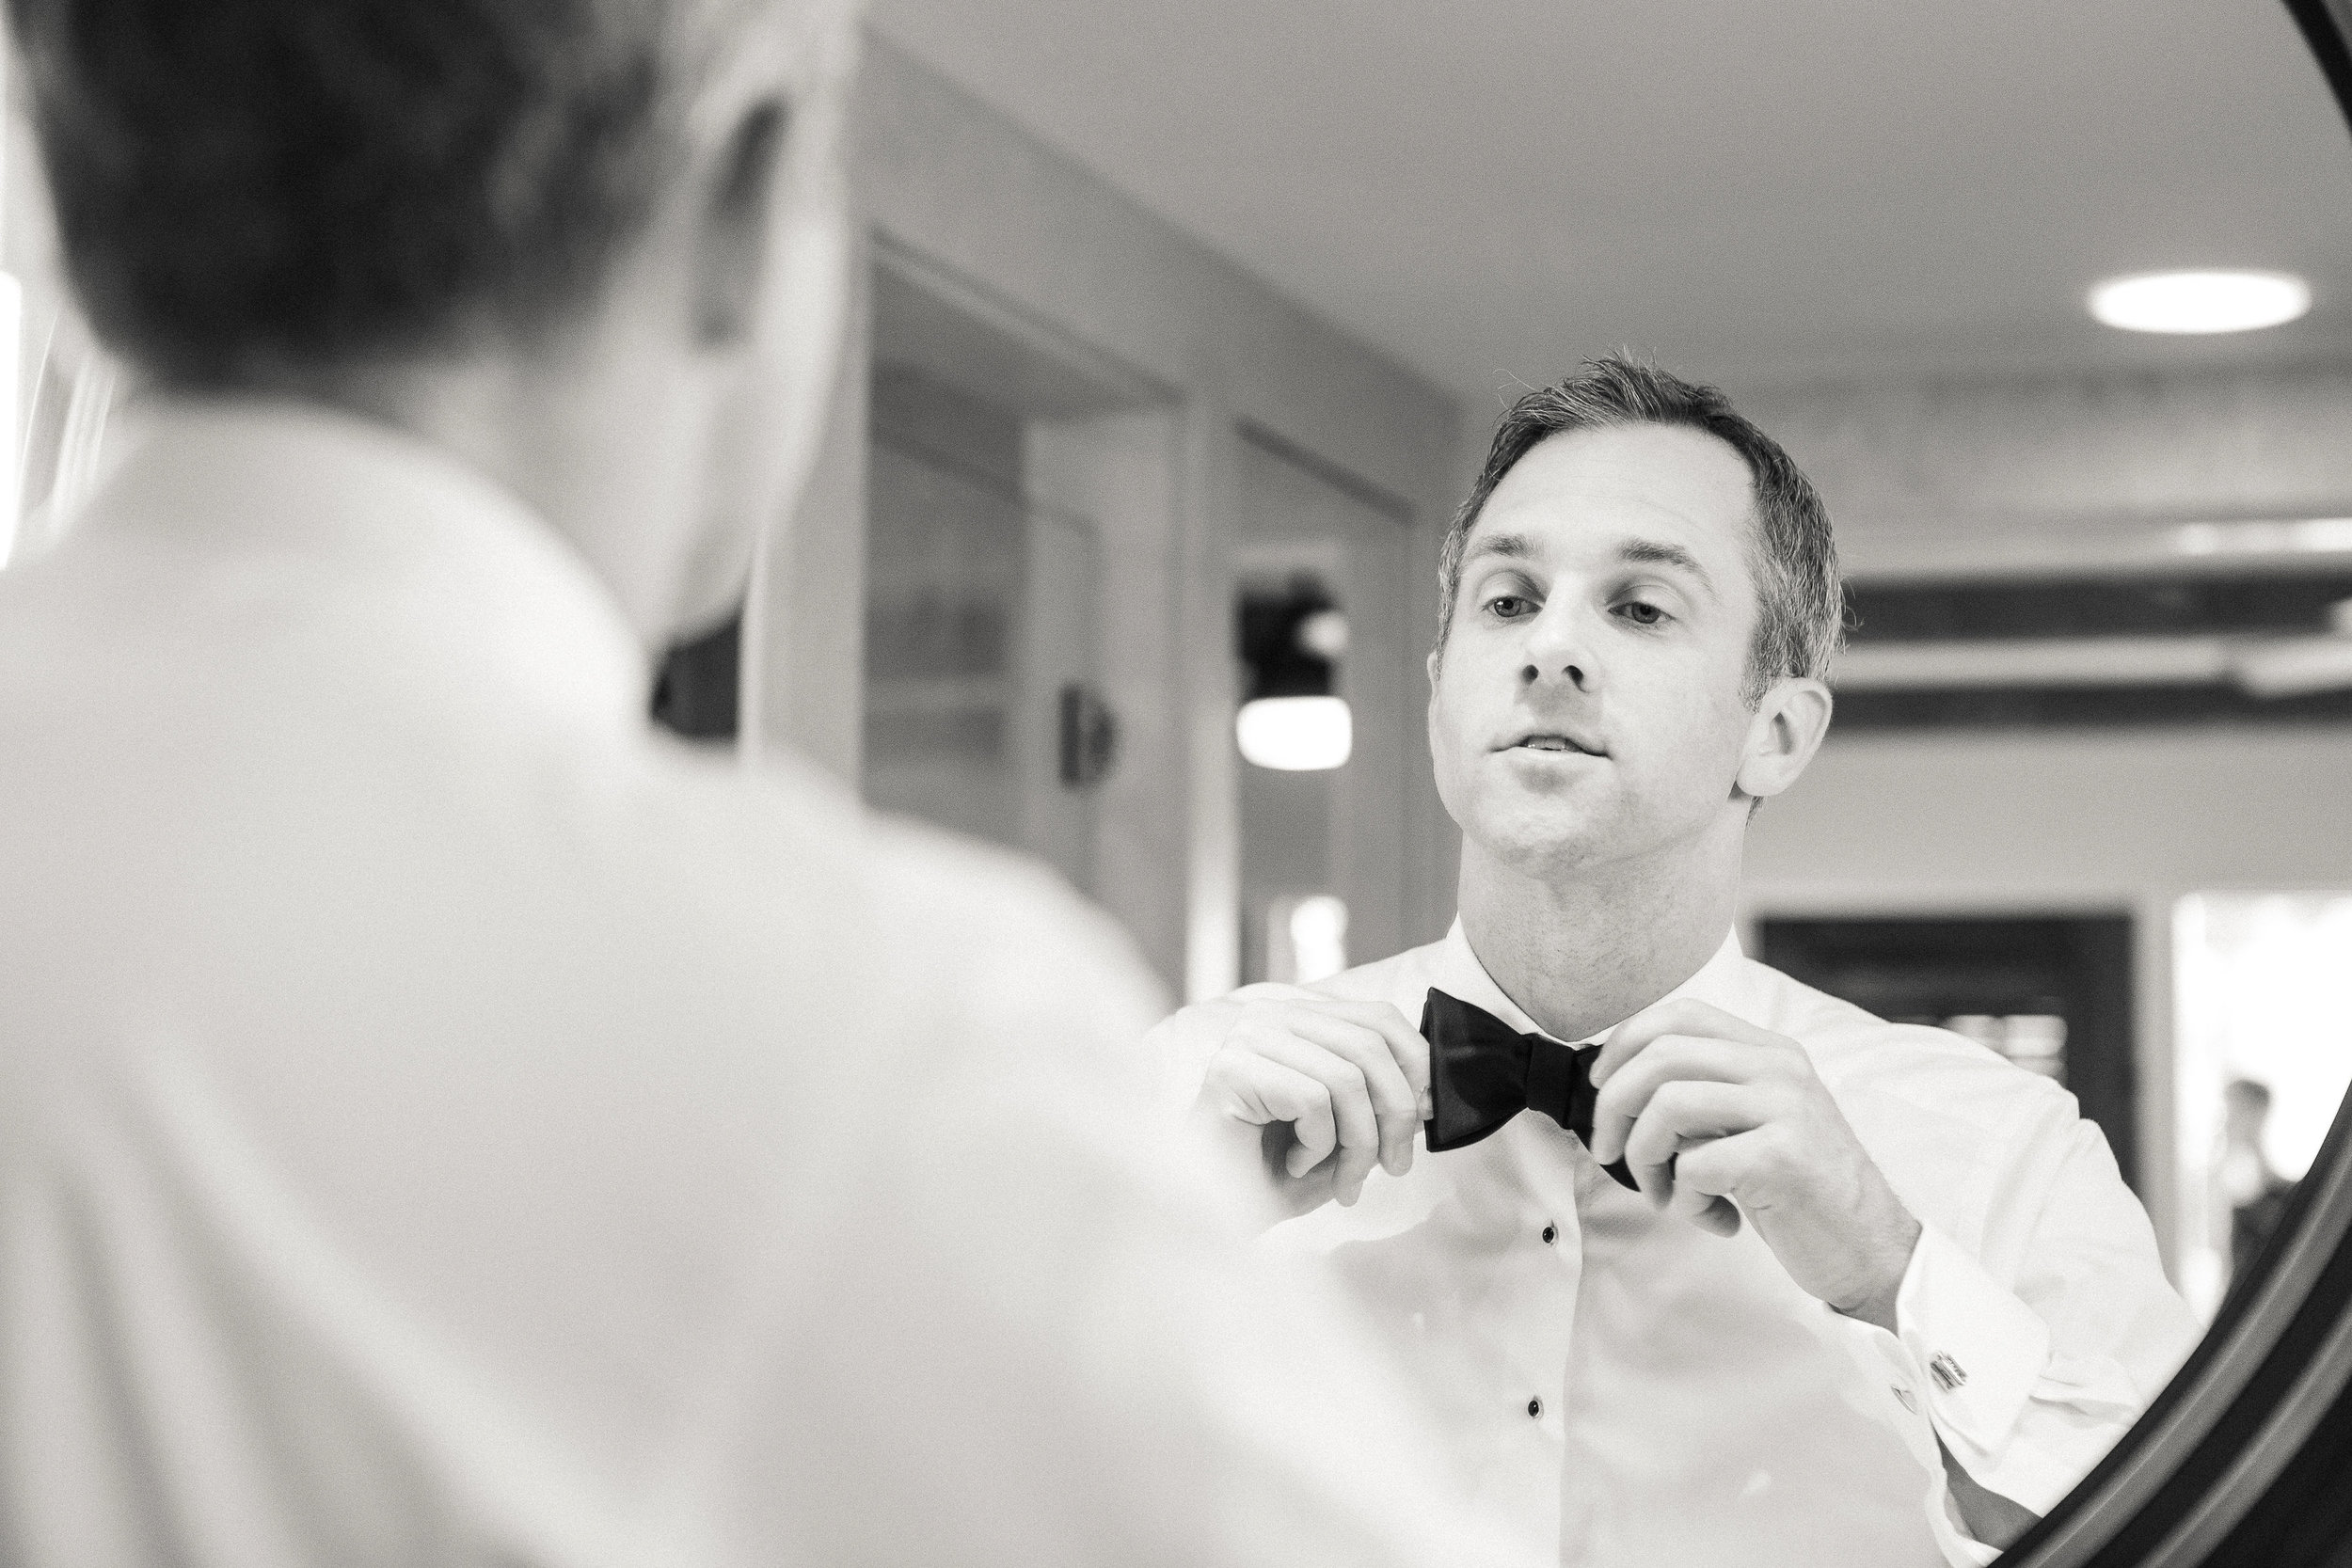 www.santabarbarawedding.com   Kiel Rucker Photography   The Ritz Carlton Bacara   Event of the Season   Groom Straightening His Bowtie